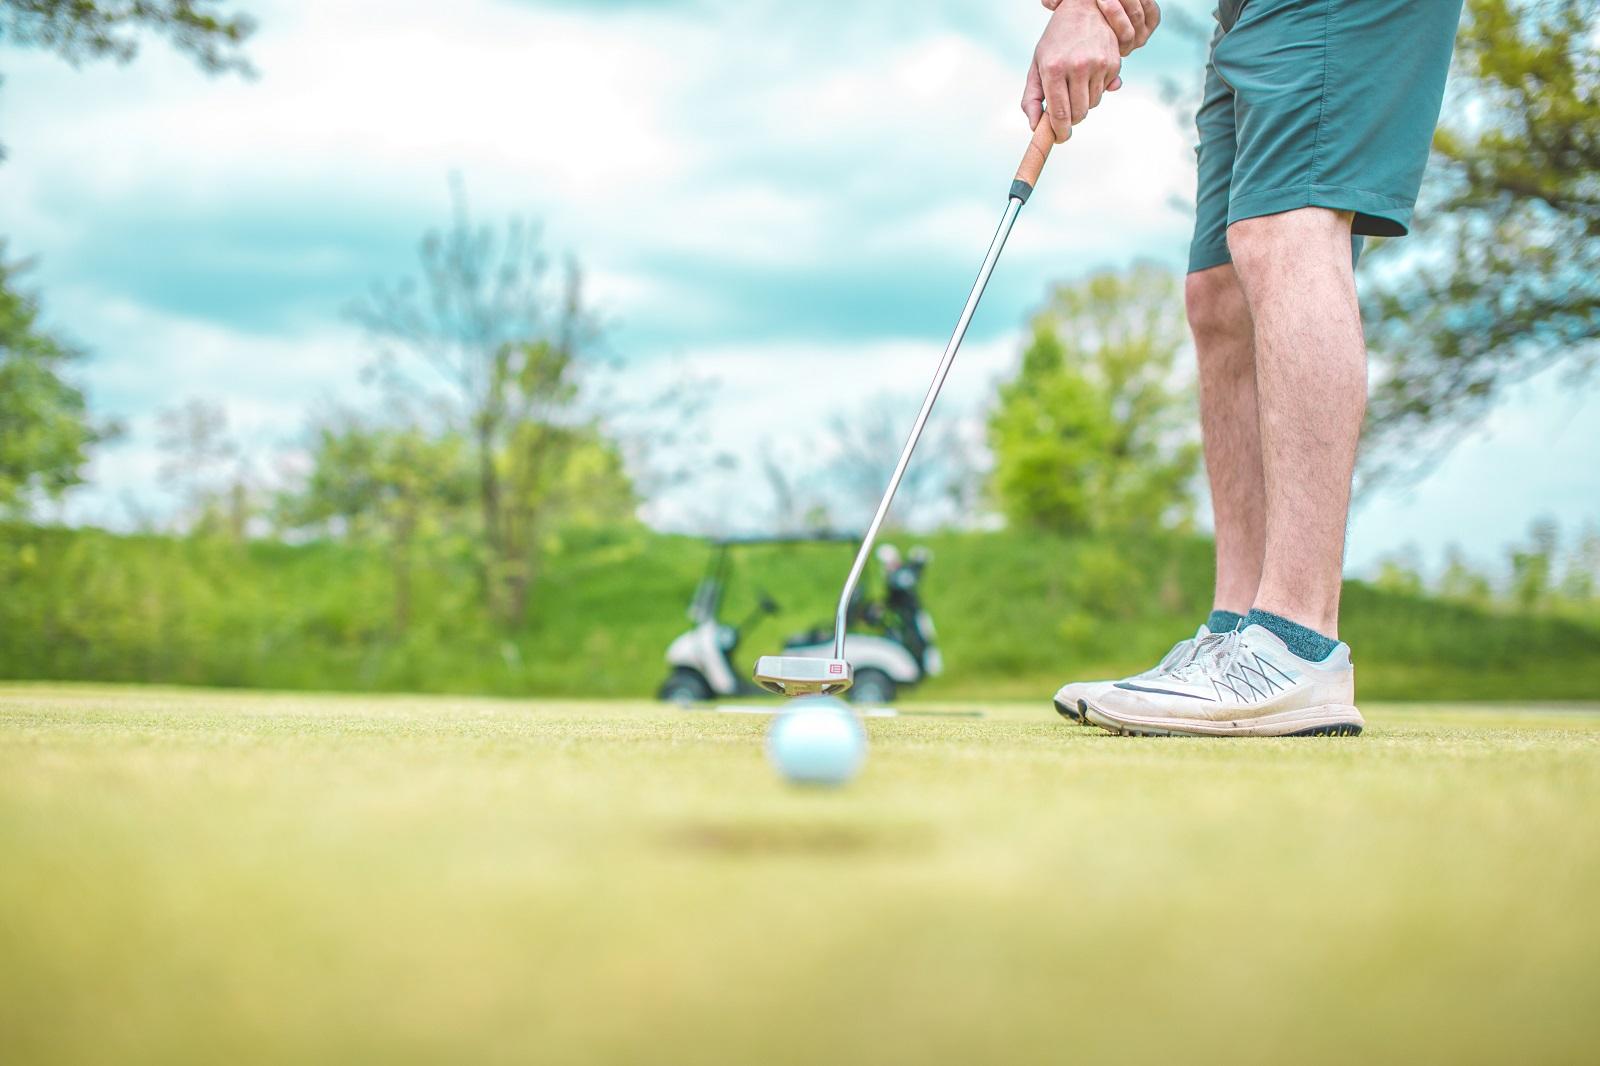 http://www.lakeshorecountryclub.com/uploads/slides/139027_mens-golf-stag.jpg